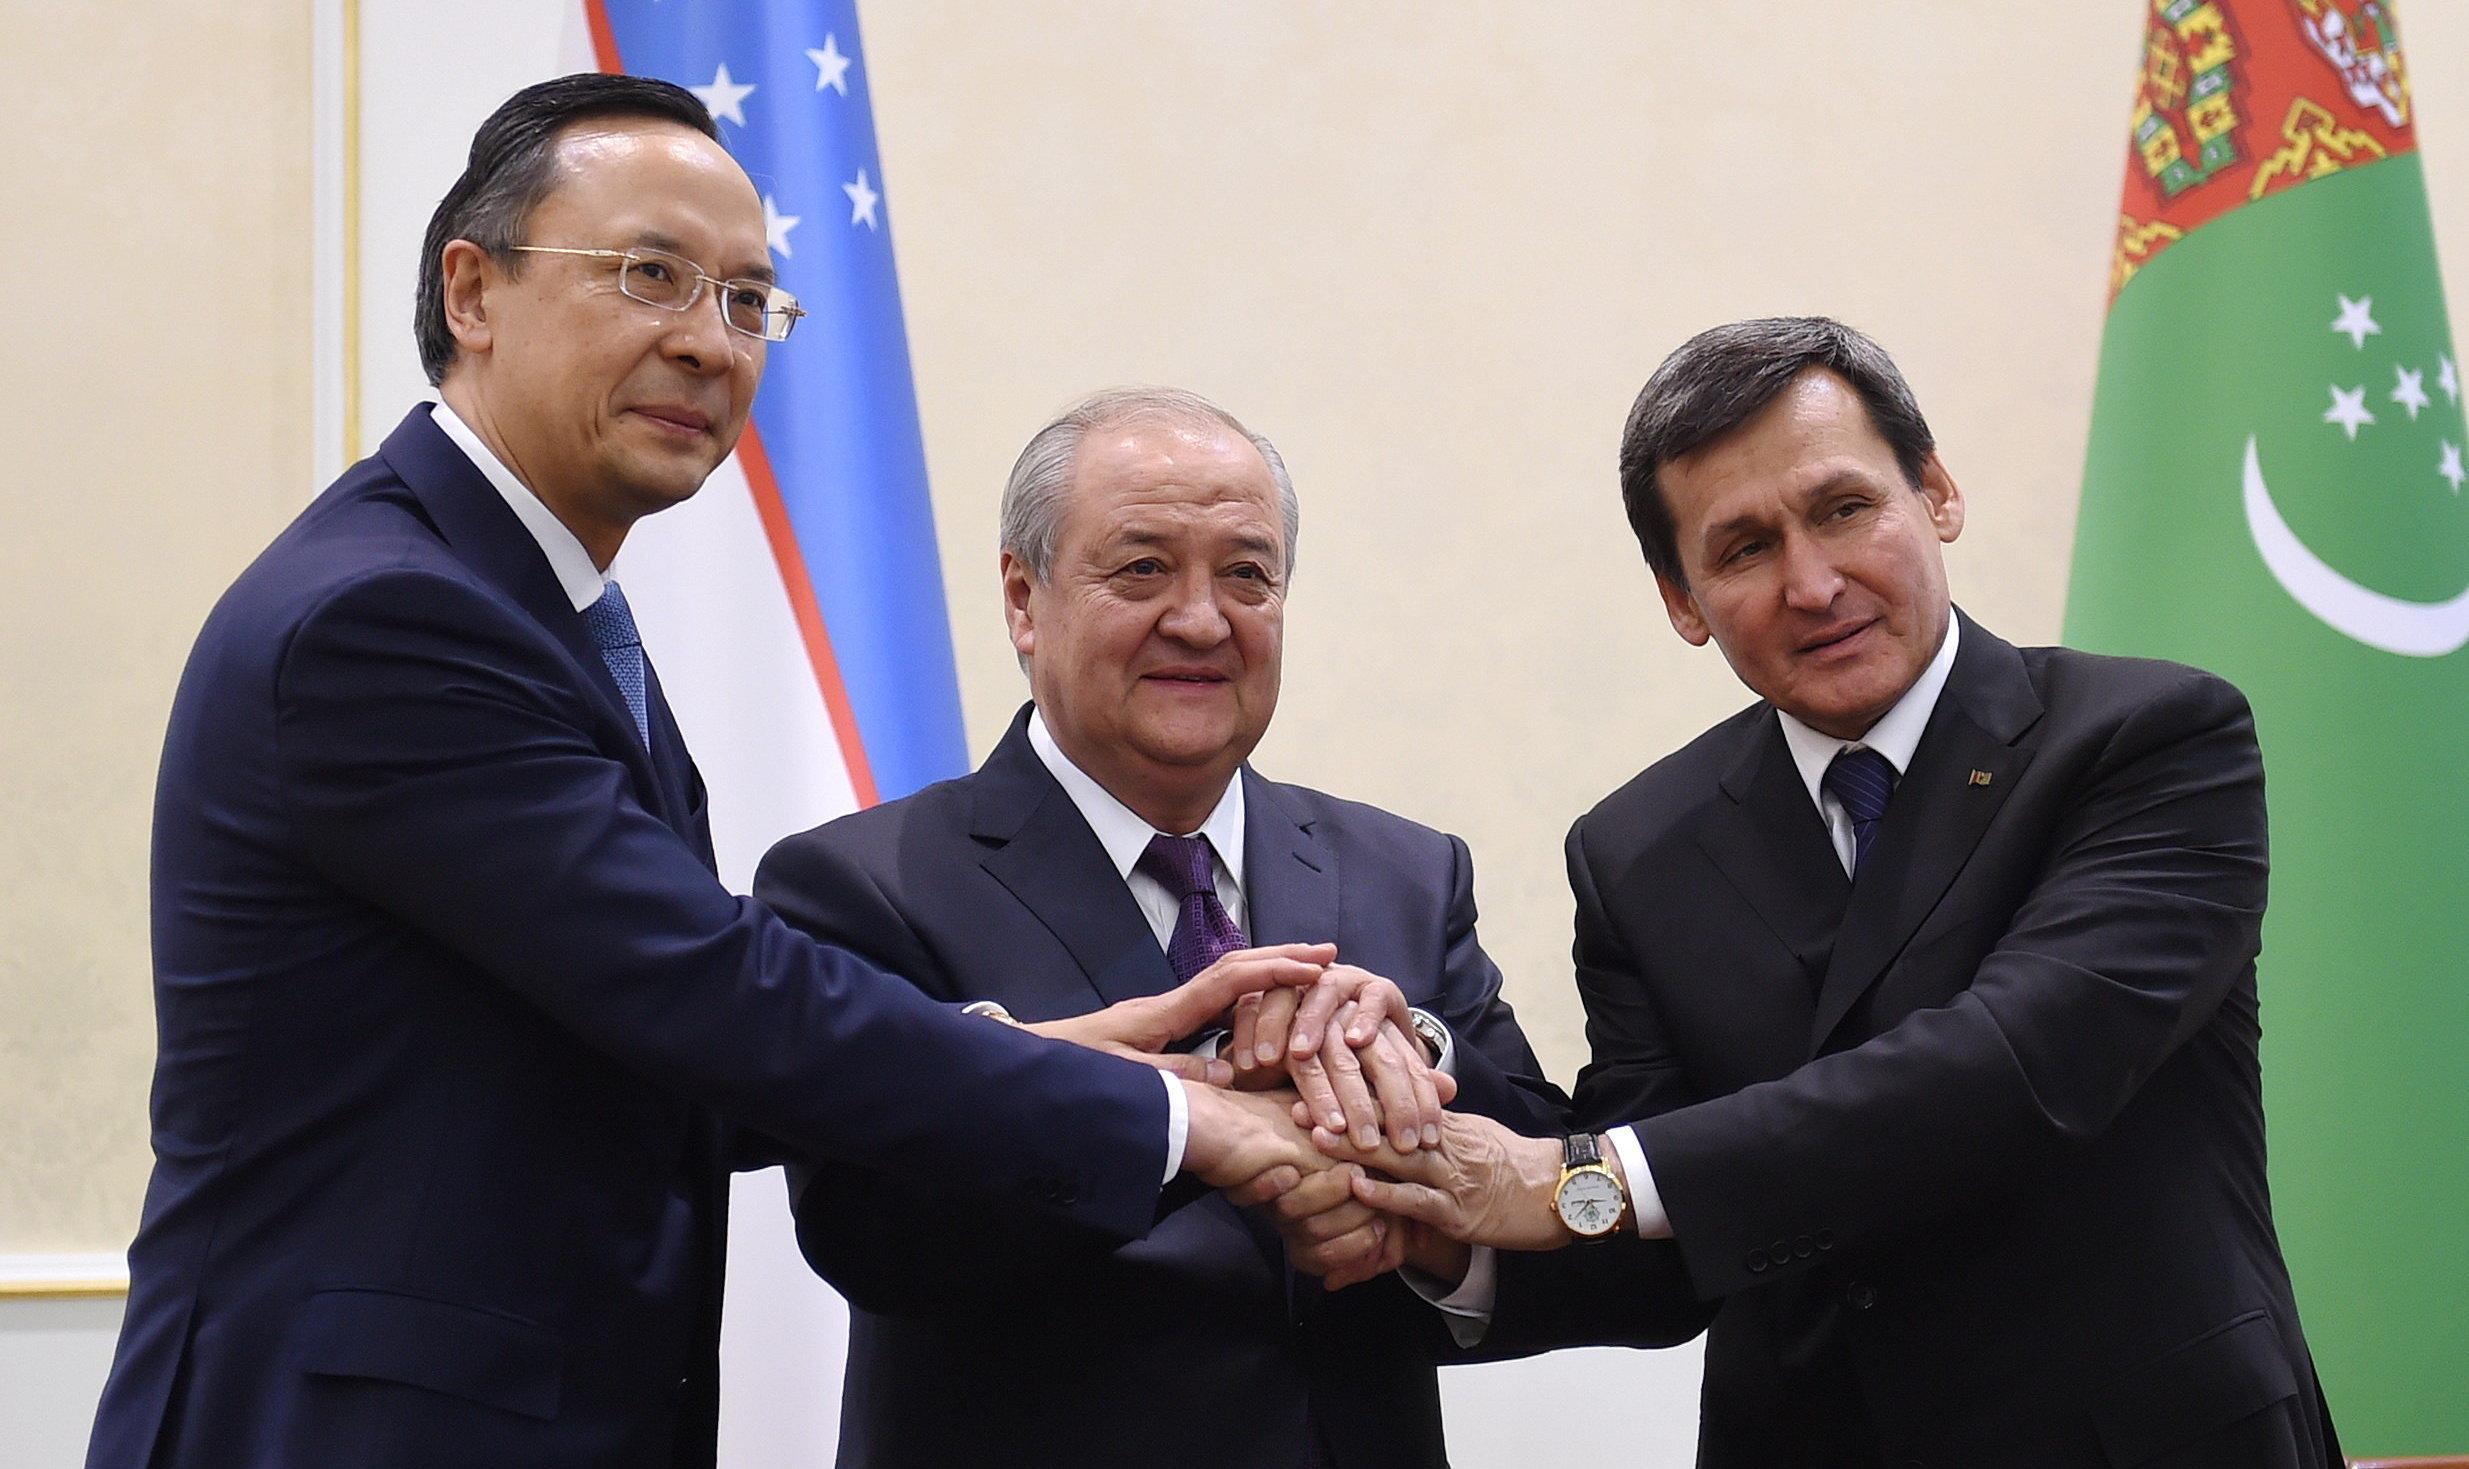 Узбекистан, Казахстан иТуркменистан подписали договор оточке стыка границ